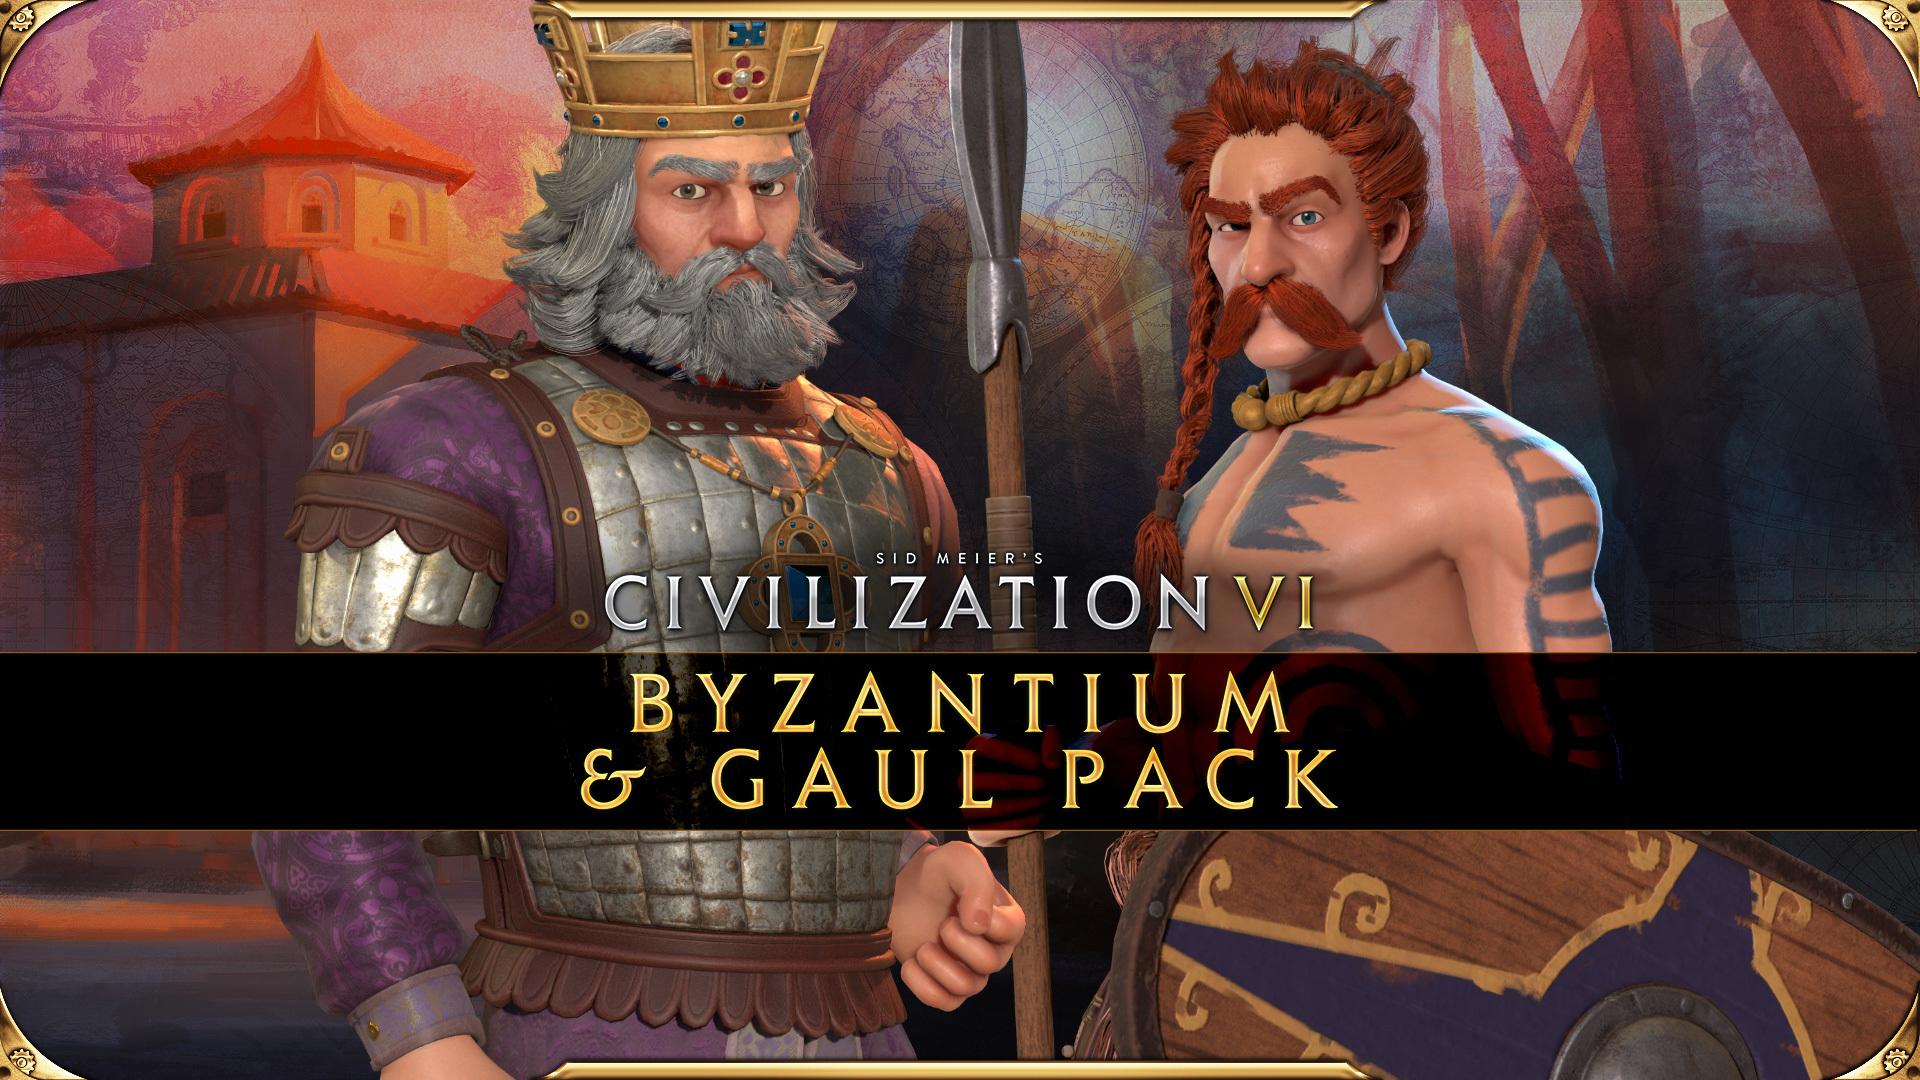 Civilization VI - Byzantium & Gaul Pack Available Now